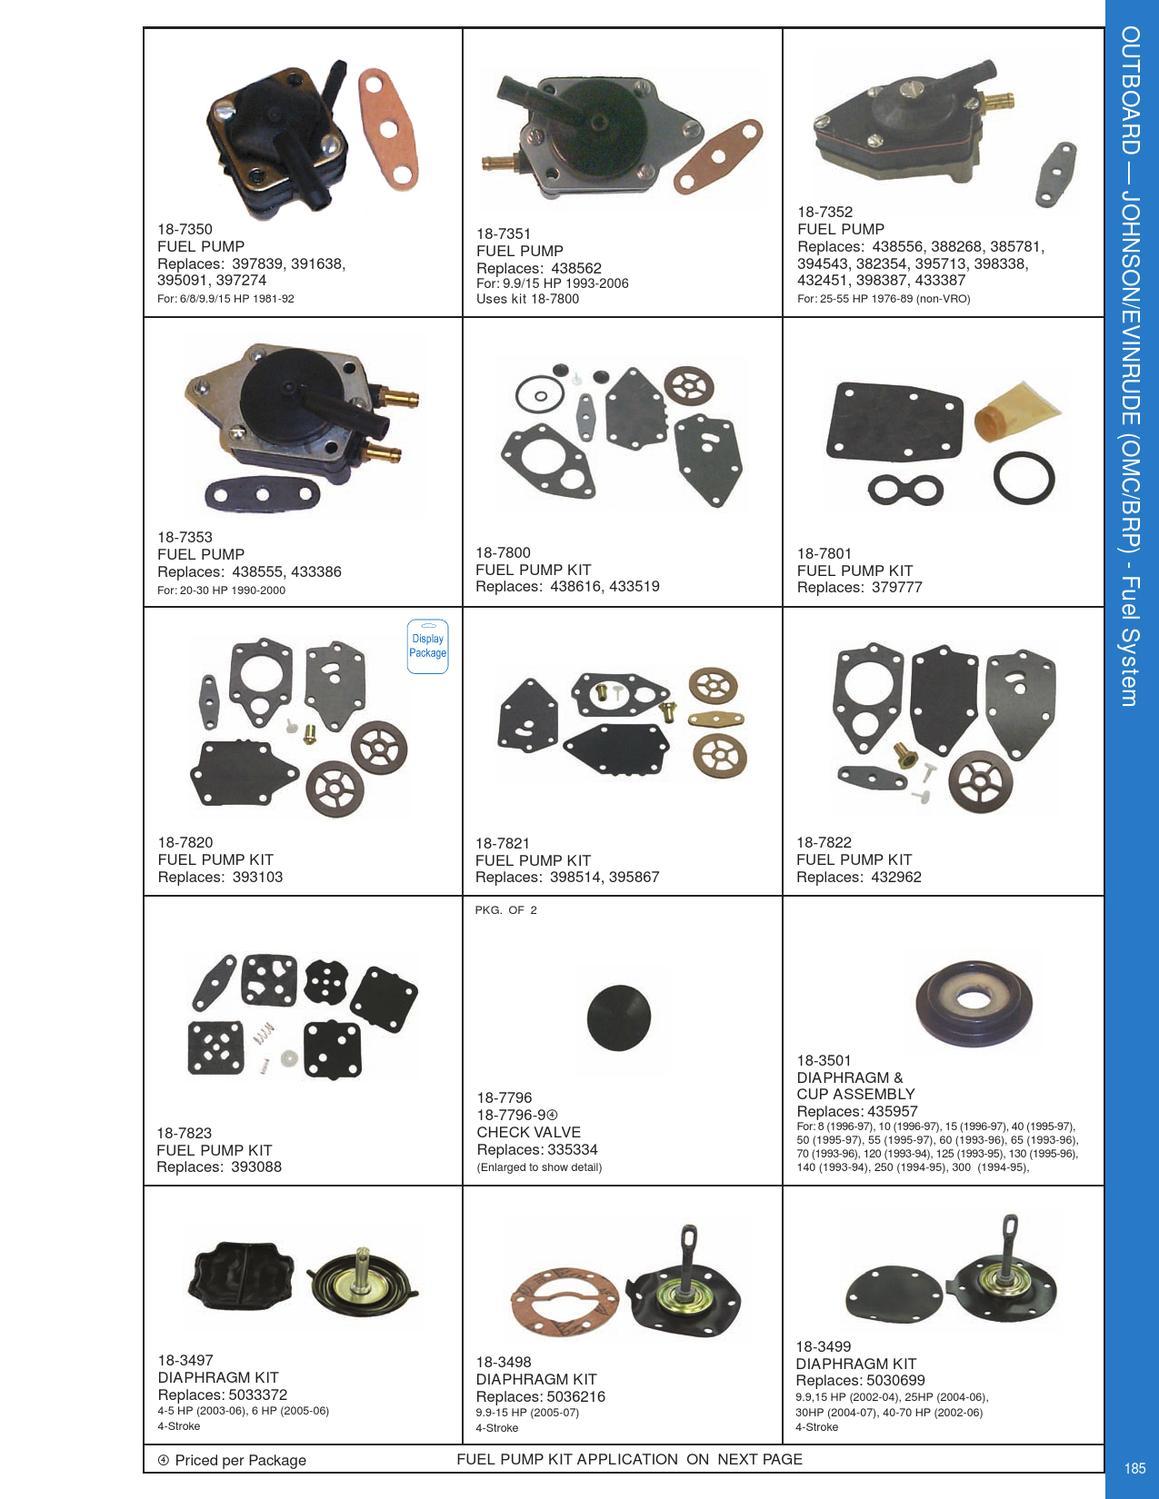 Sierra catalog 2012 page1 - page446 by BLA - issuu